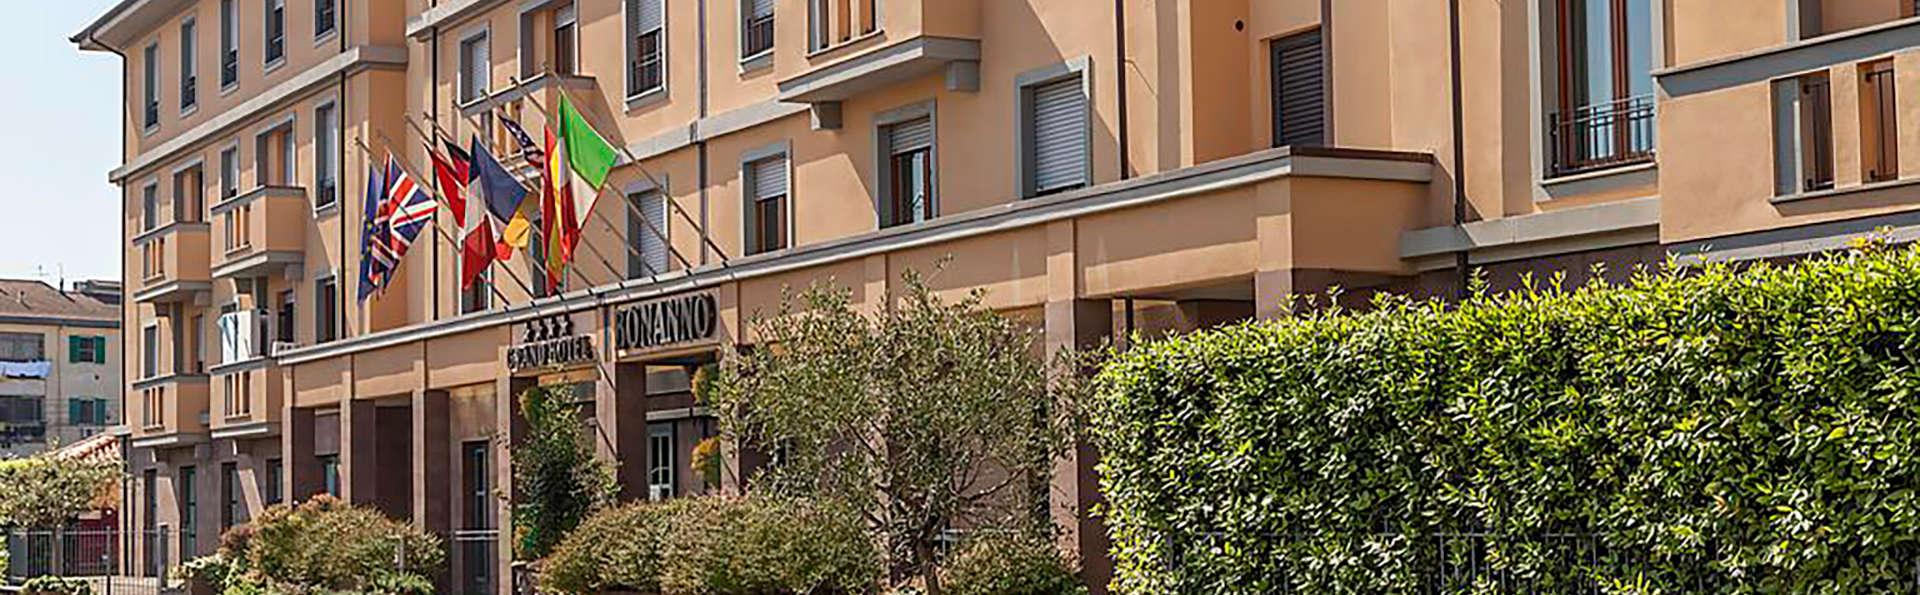 Grand Hotel Bonanno - Edit_N_Front.jpg